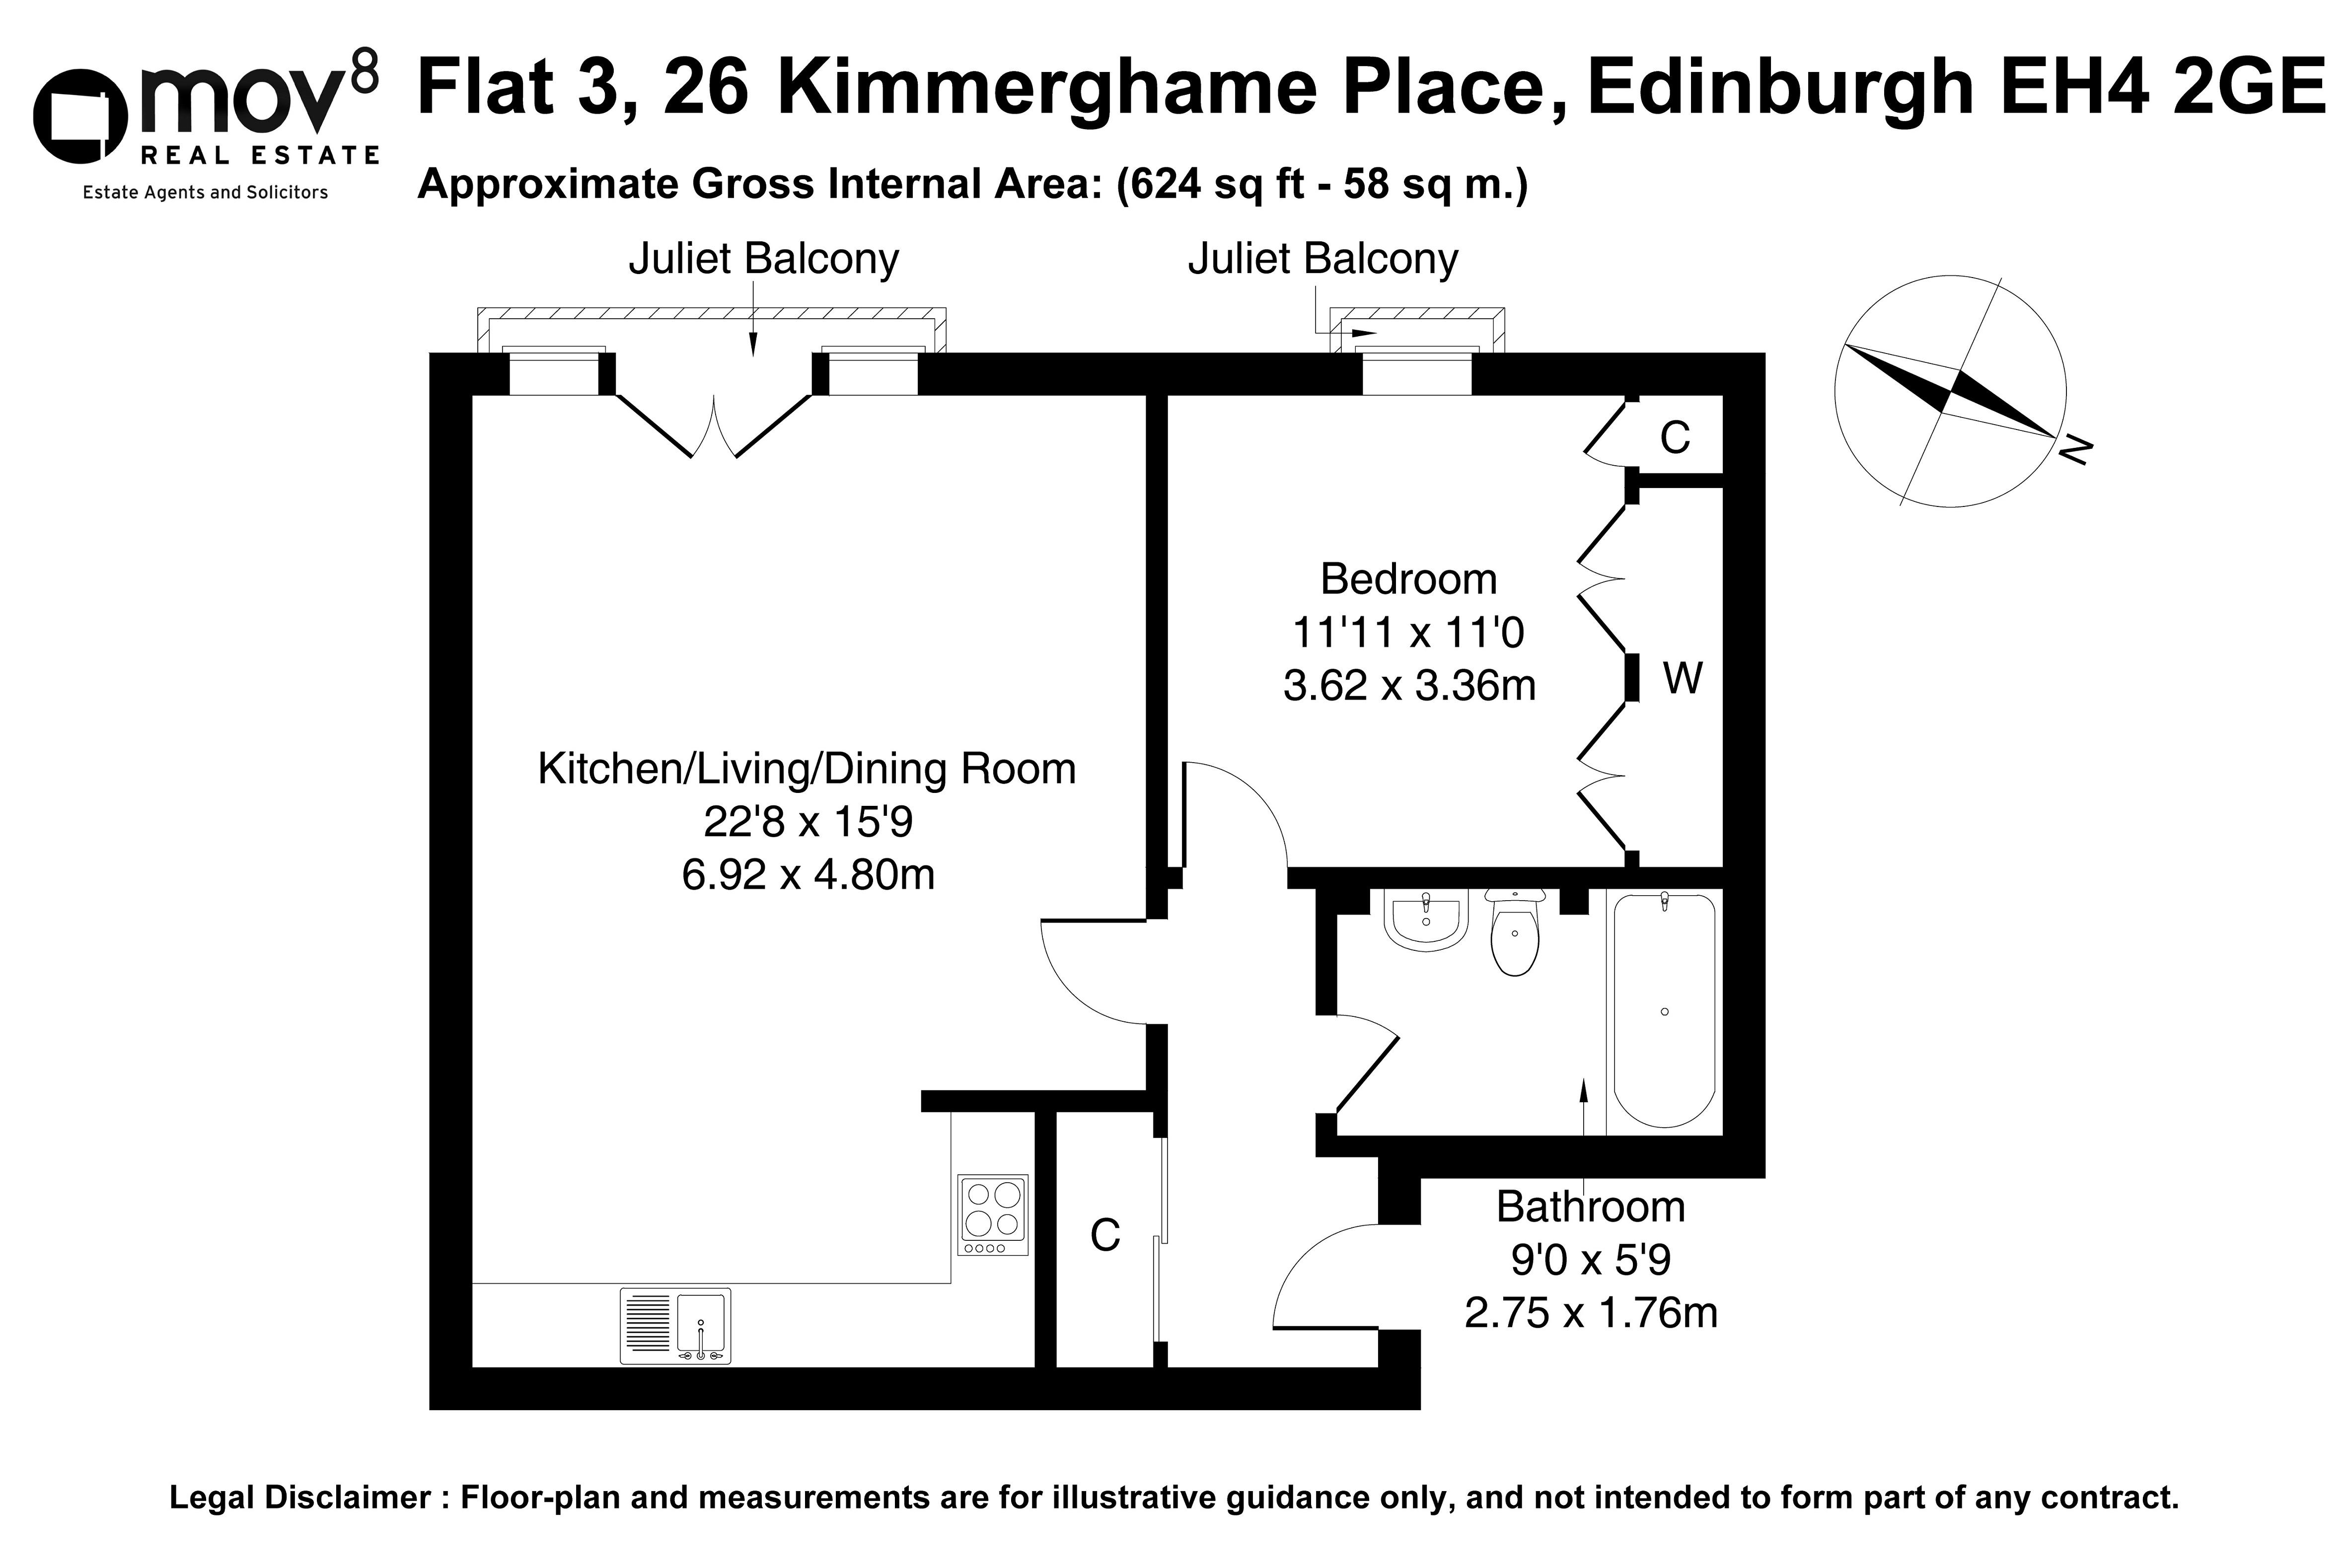 Floorplan 1 of Flat 3, 26 Kimmerghame Place, Fettes, Edinburgh, EH4 2GE